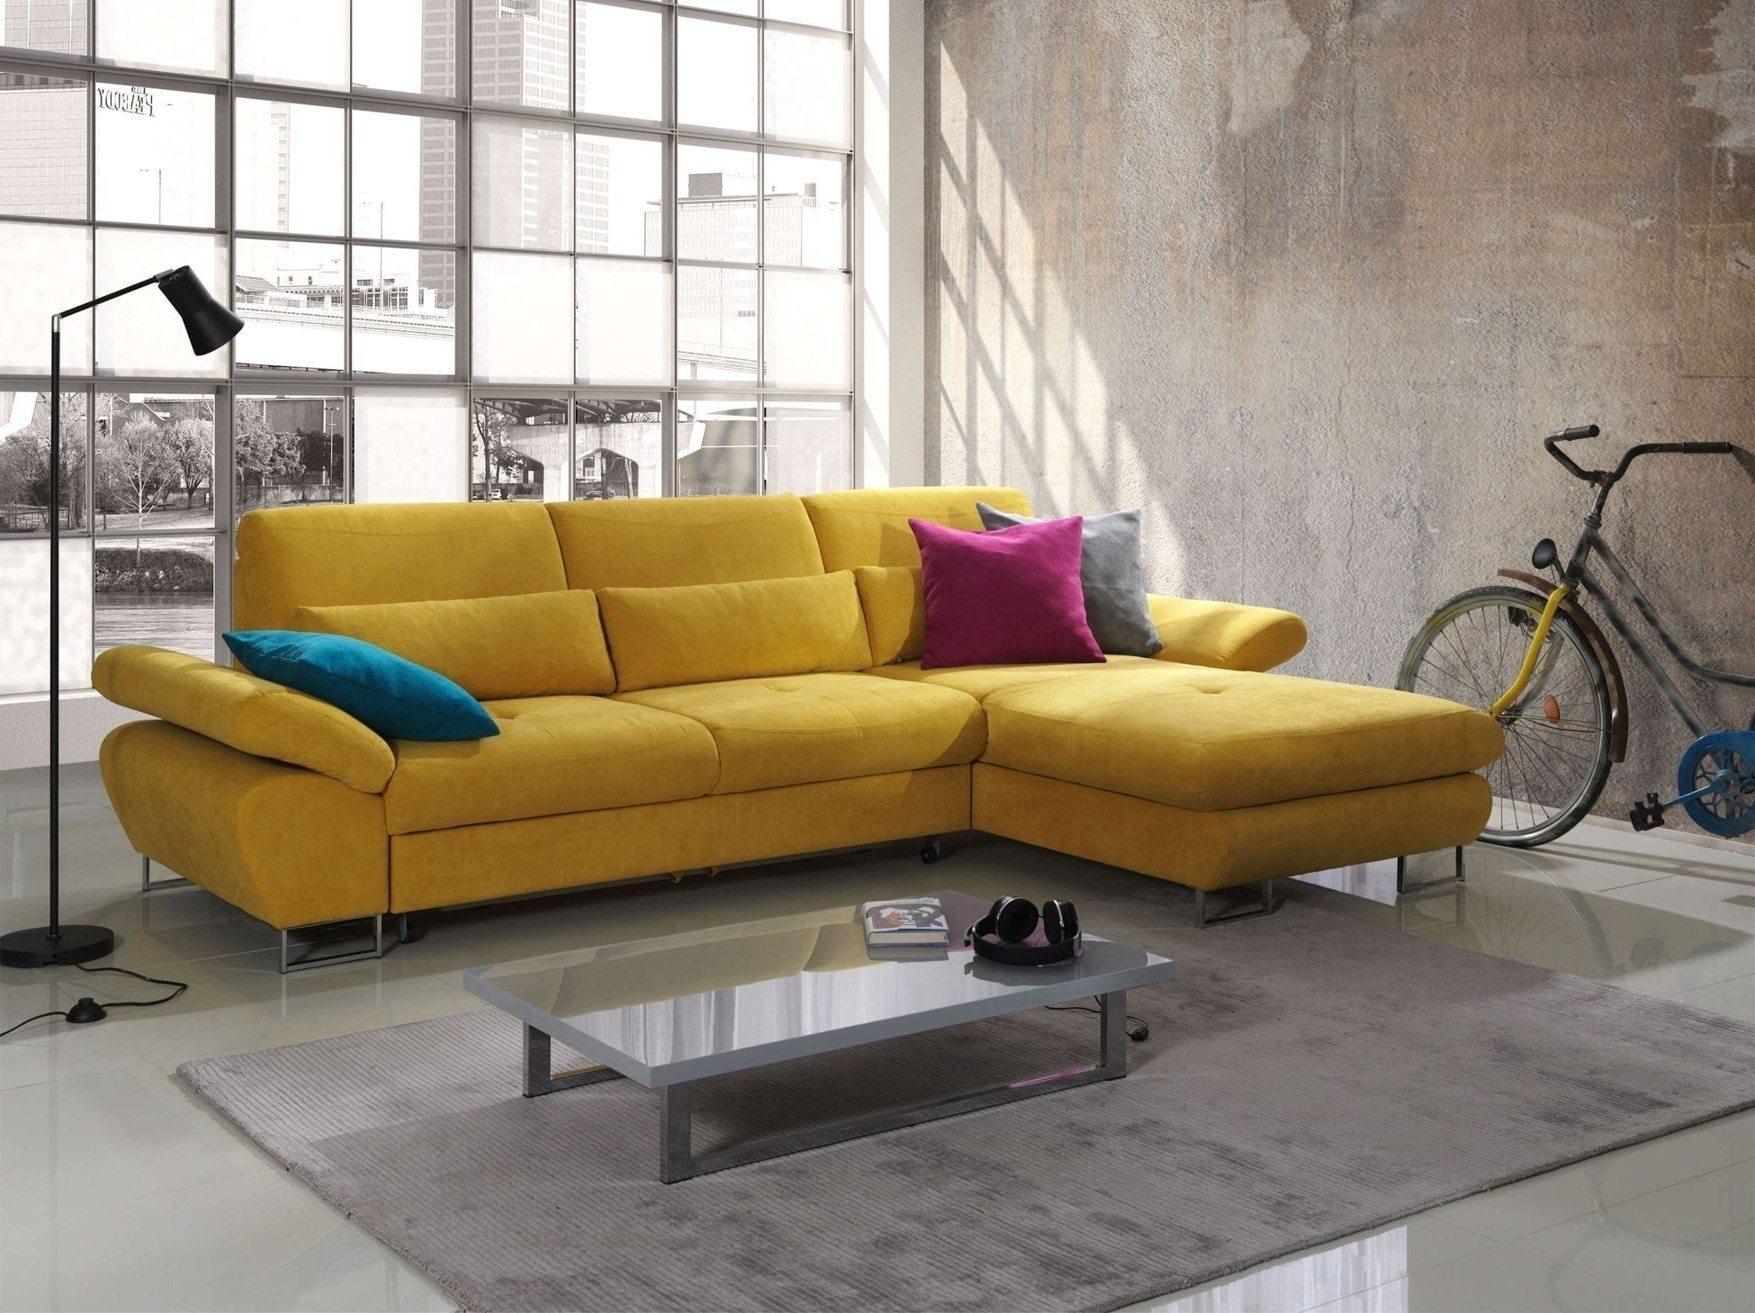 Furniture : Sleeper Sofa Eugene Oregon Mattress Firm Liberty Mo With Regard To Everett Wa Sectional Sofas (View 7 of 10)